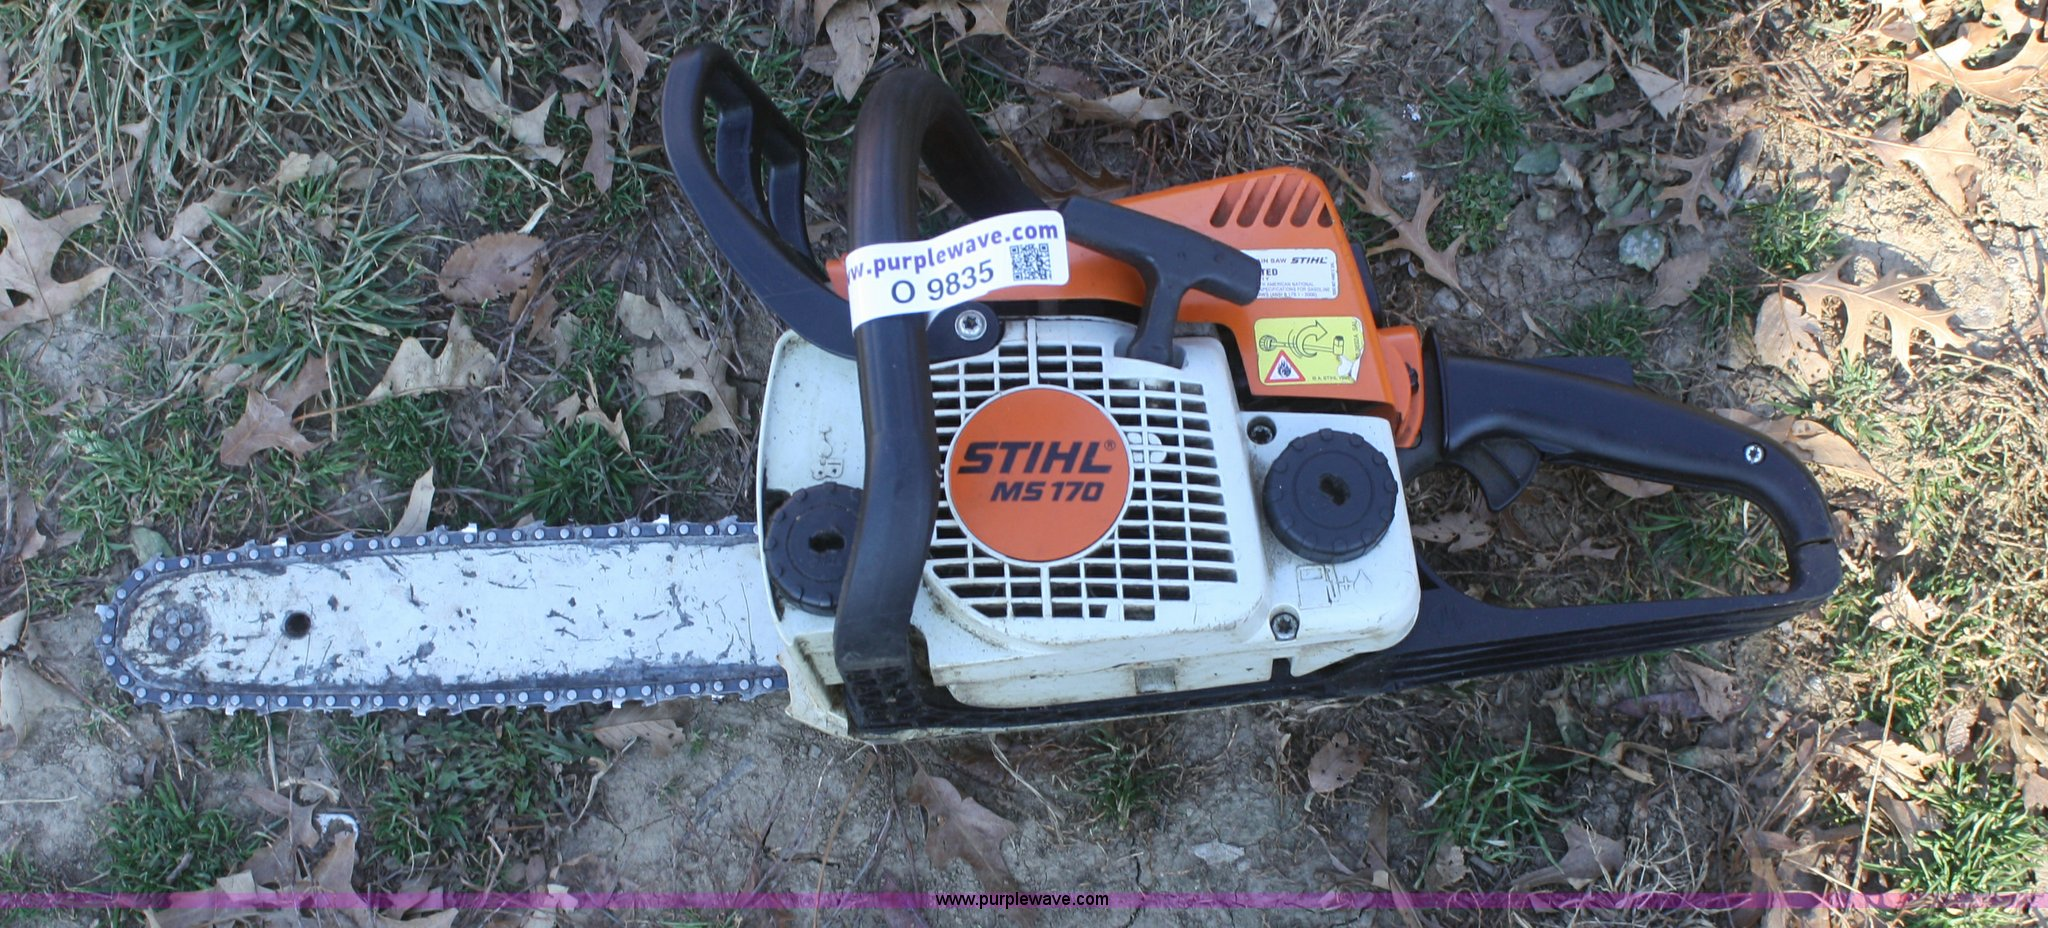 Stihl MS170 chain saw | Item O9835 | SOLD! Thursday December